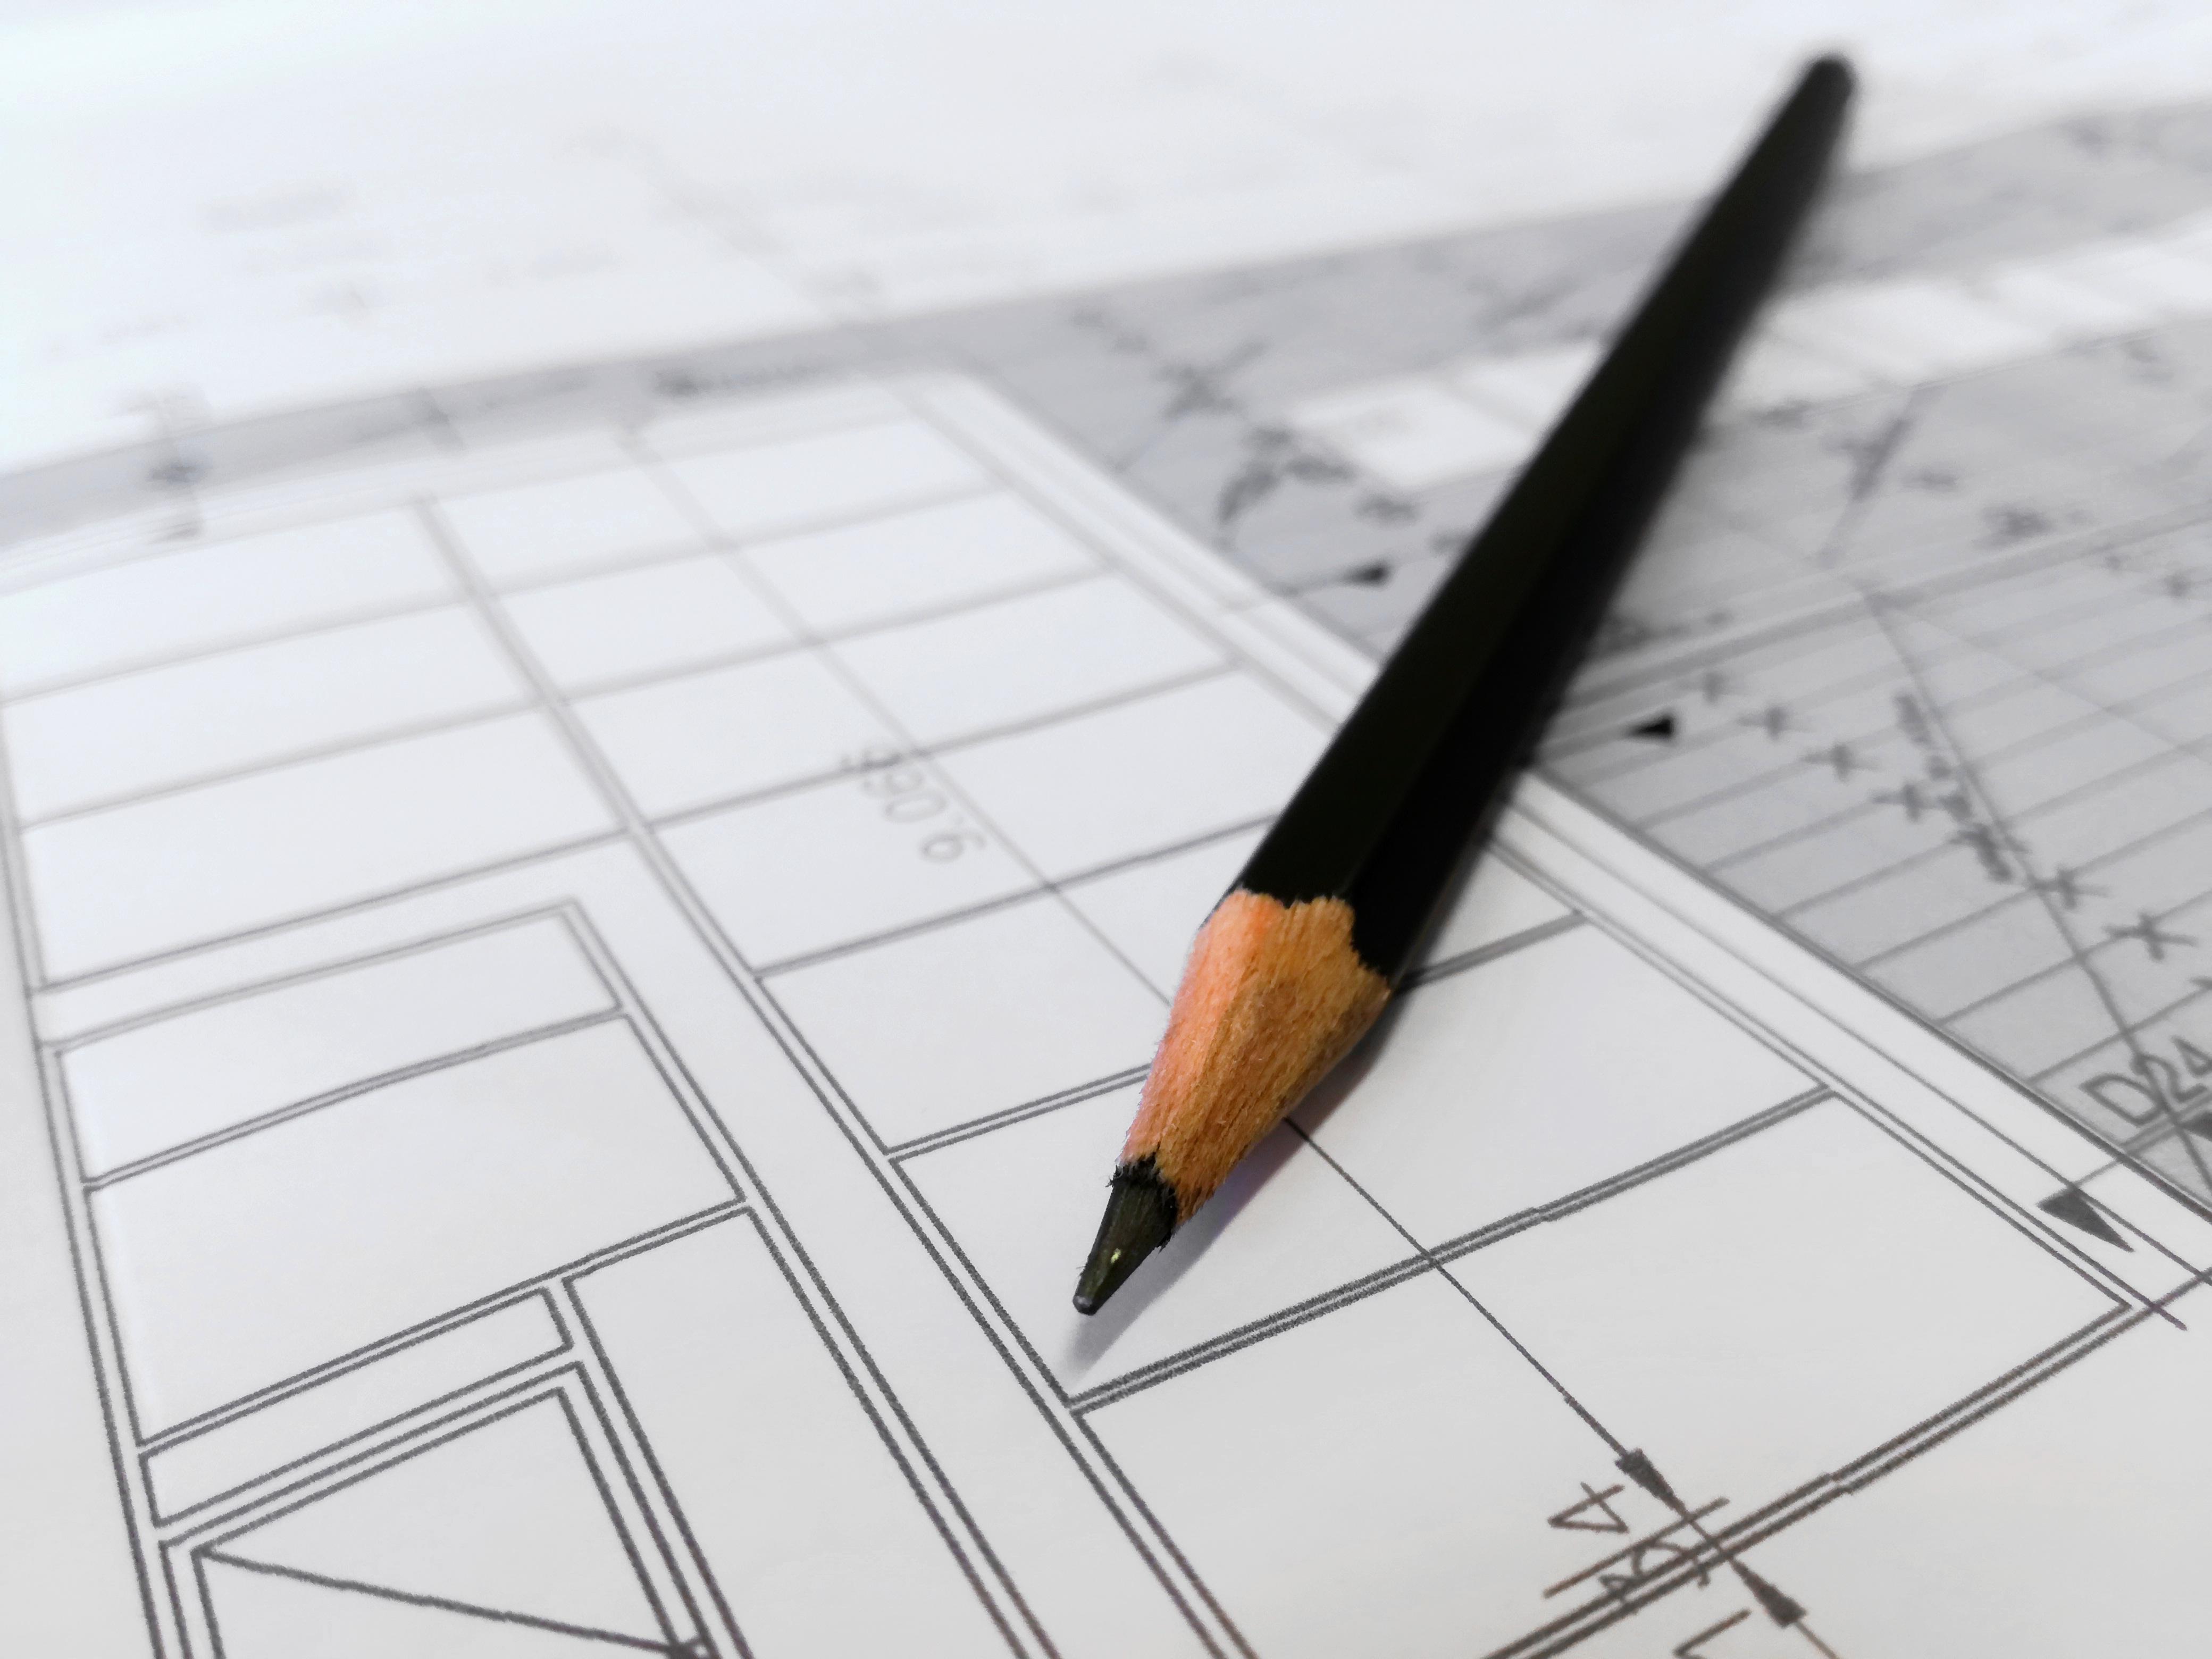 Fotos gratis : escritura, lápiz, bolígrafo, arquitecto, línea ...